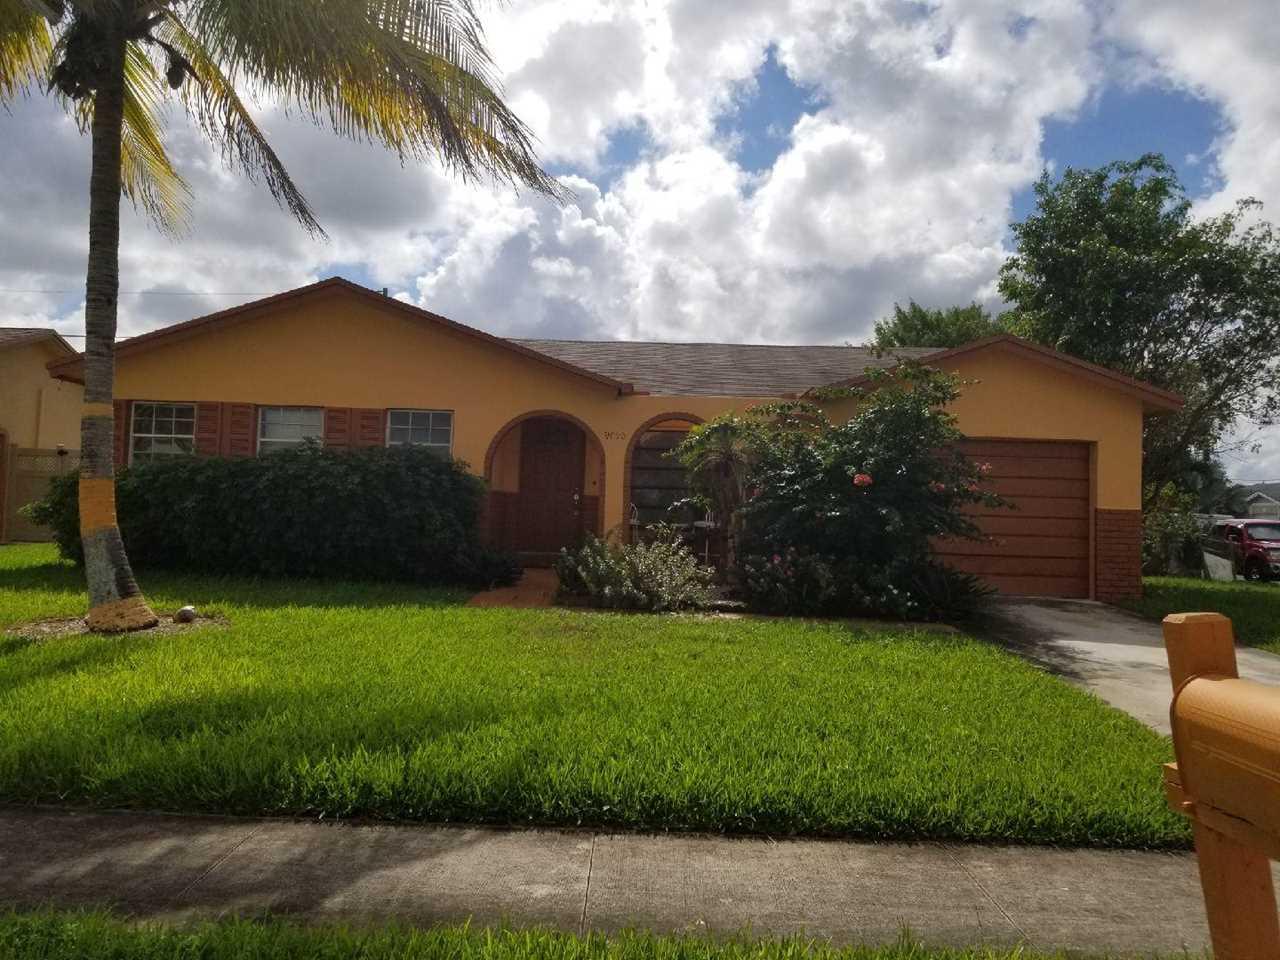 9090 SW 1St Road Boca Raton, FL 33428 - MLS# RX-10482538 | BocaRatonRealEstate.com Photo 1